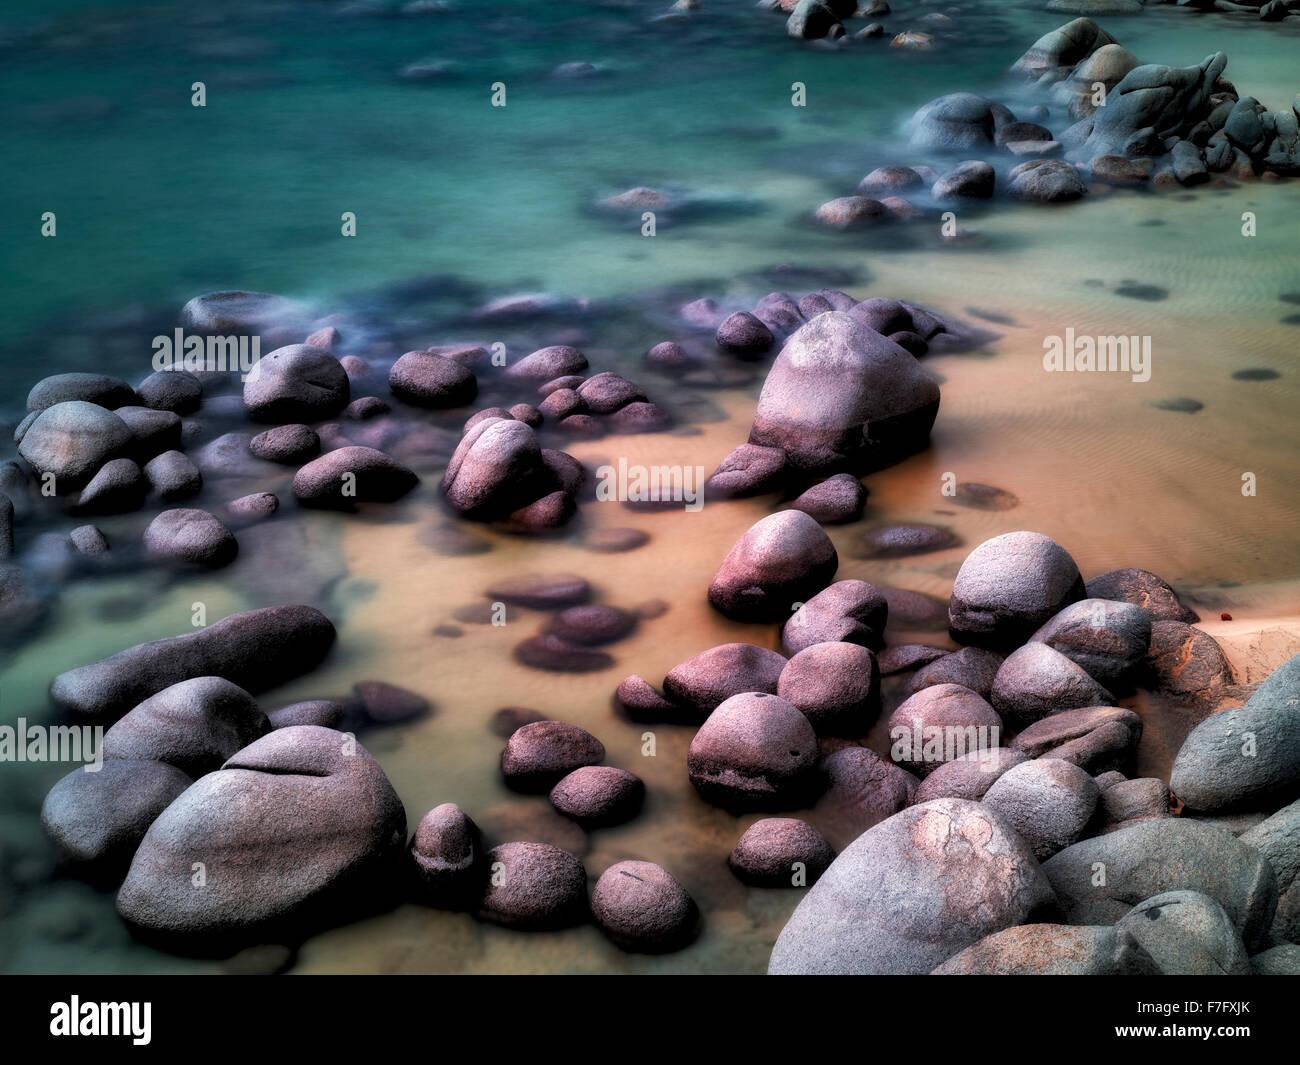 Findlinge am Strand Ufer des Lake Tahoe, Nevada Stockbild